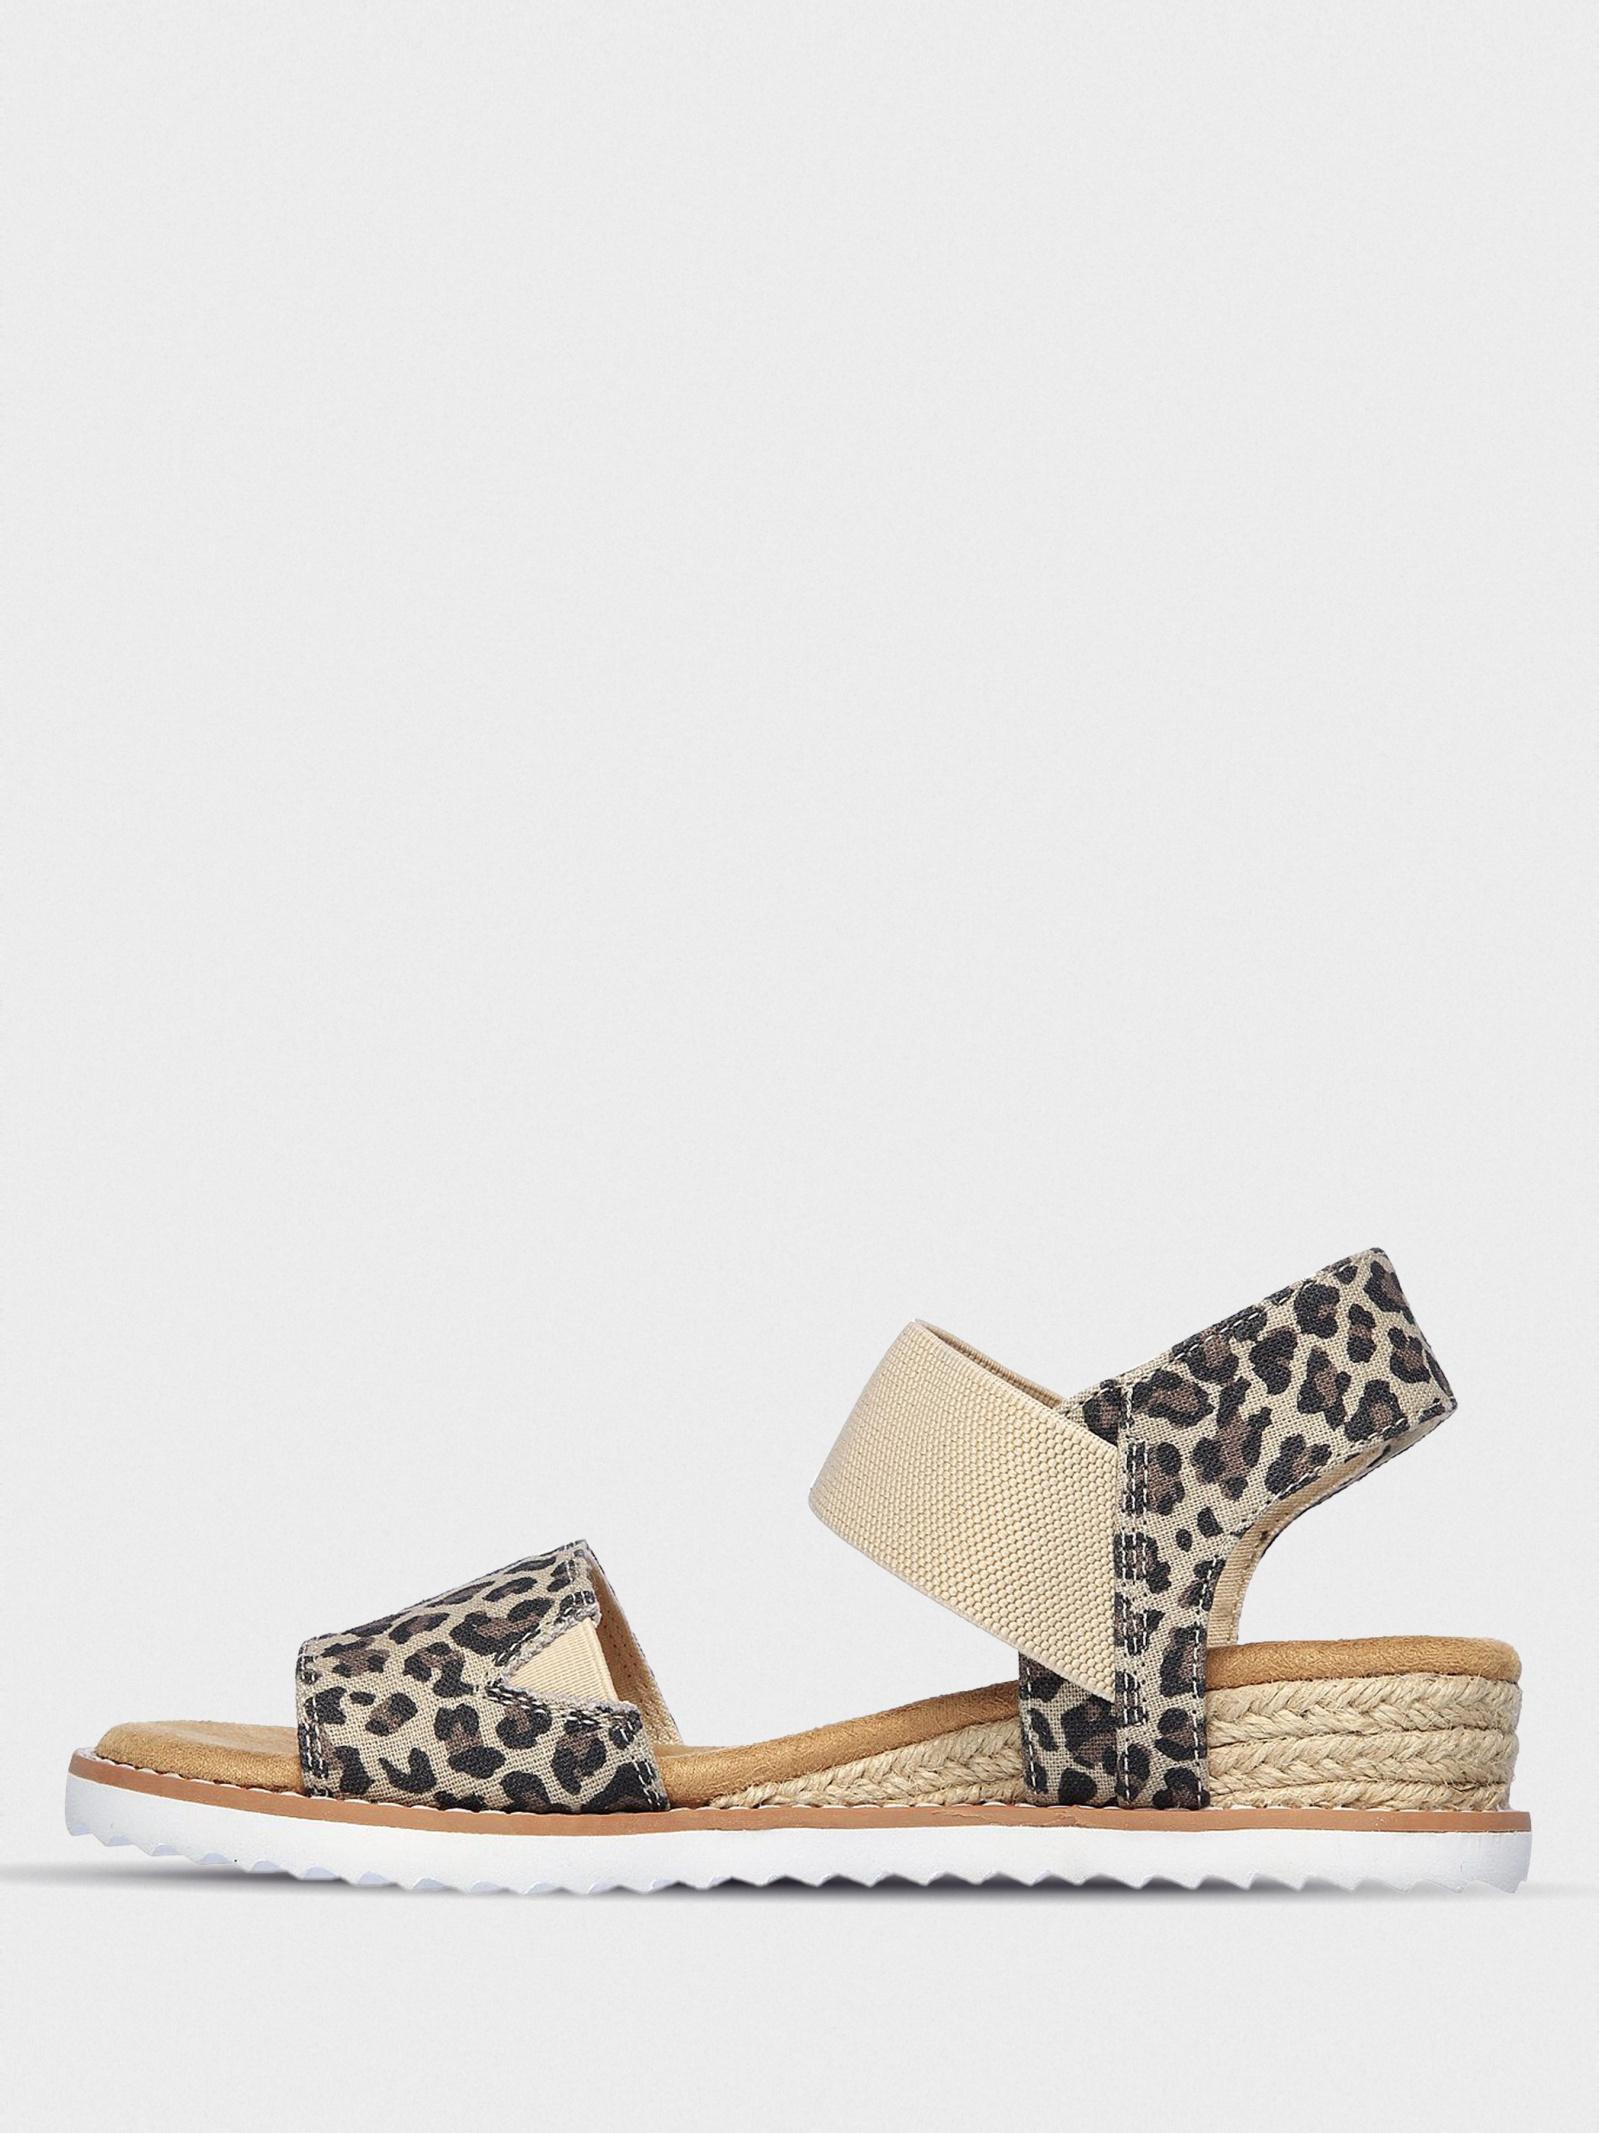 Сандалии для женщин Skechers Bob's KW5507 размеры обуви, 2017